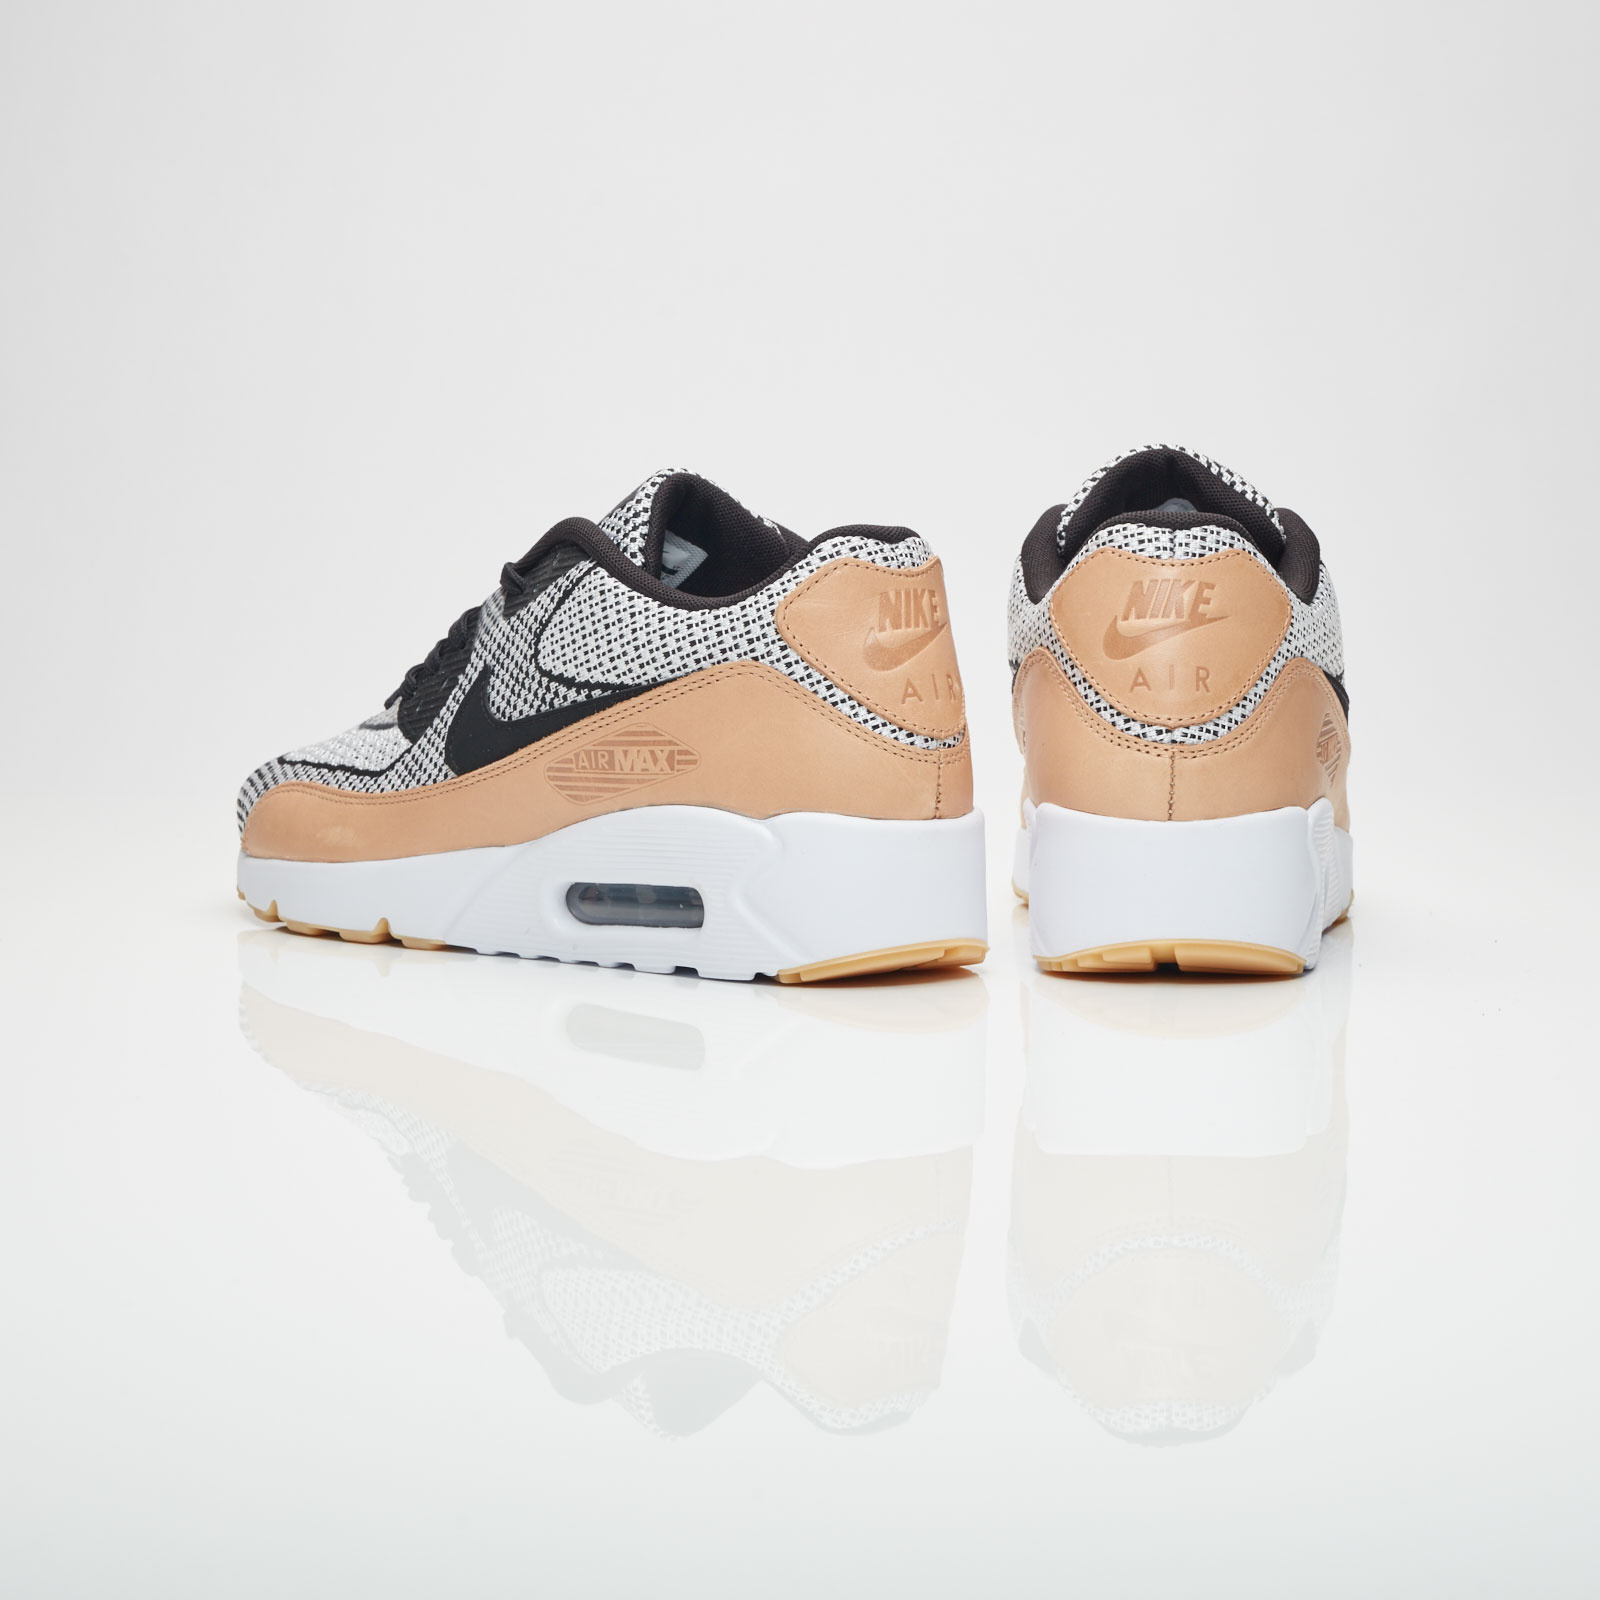 223811c560 Nike Air Max Ultra 2.0 JCRD BR - 898008-100 - Sneakersnstuff | sneakers &  streetwear online since 1999